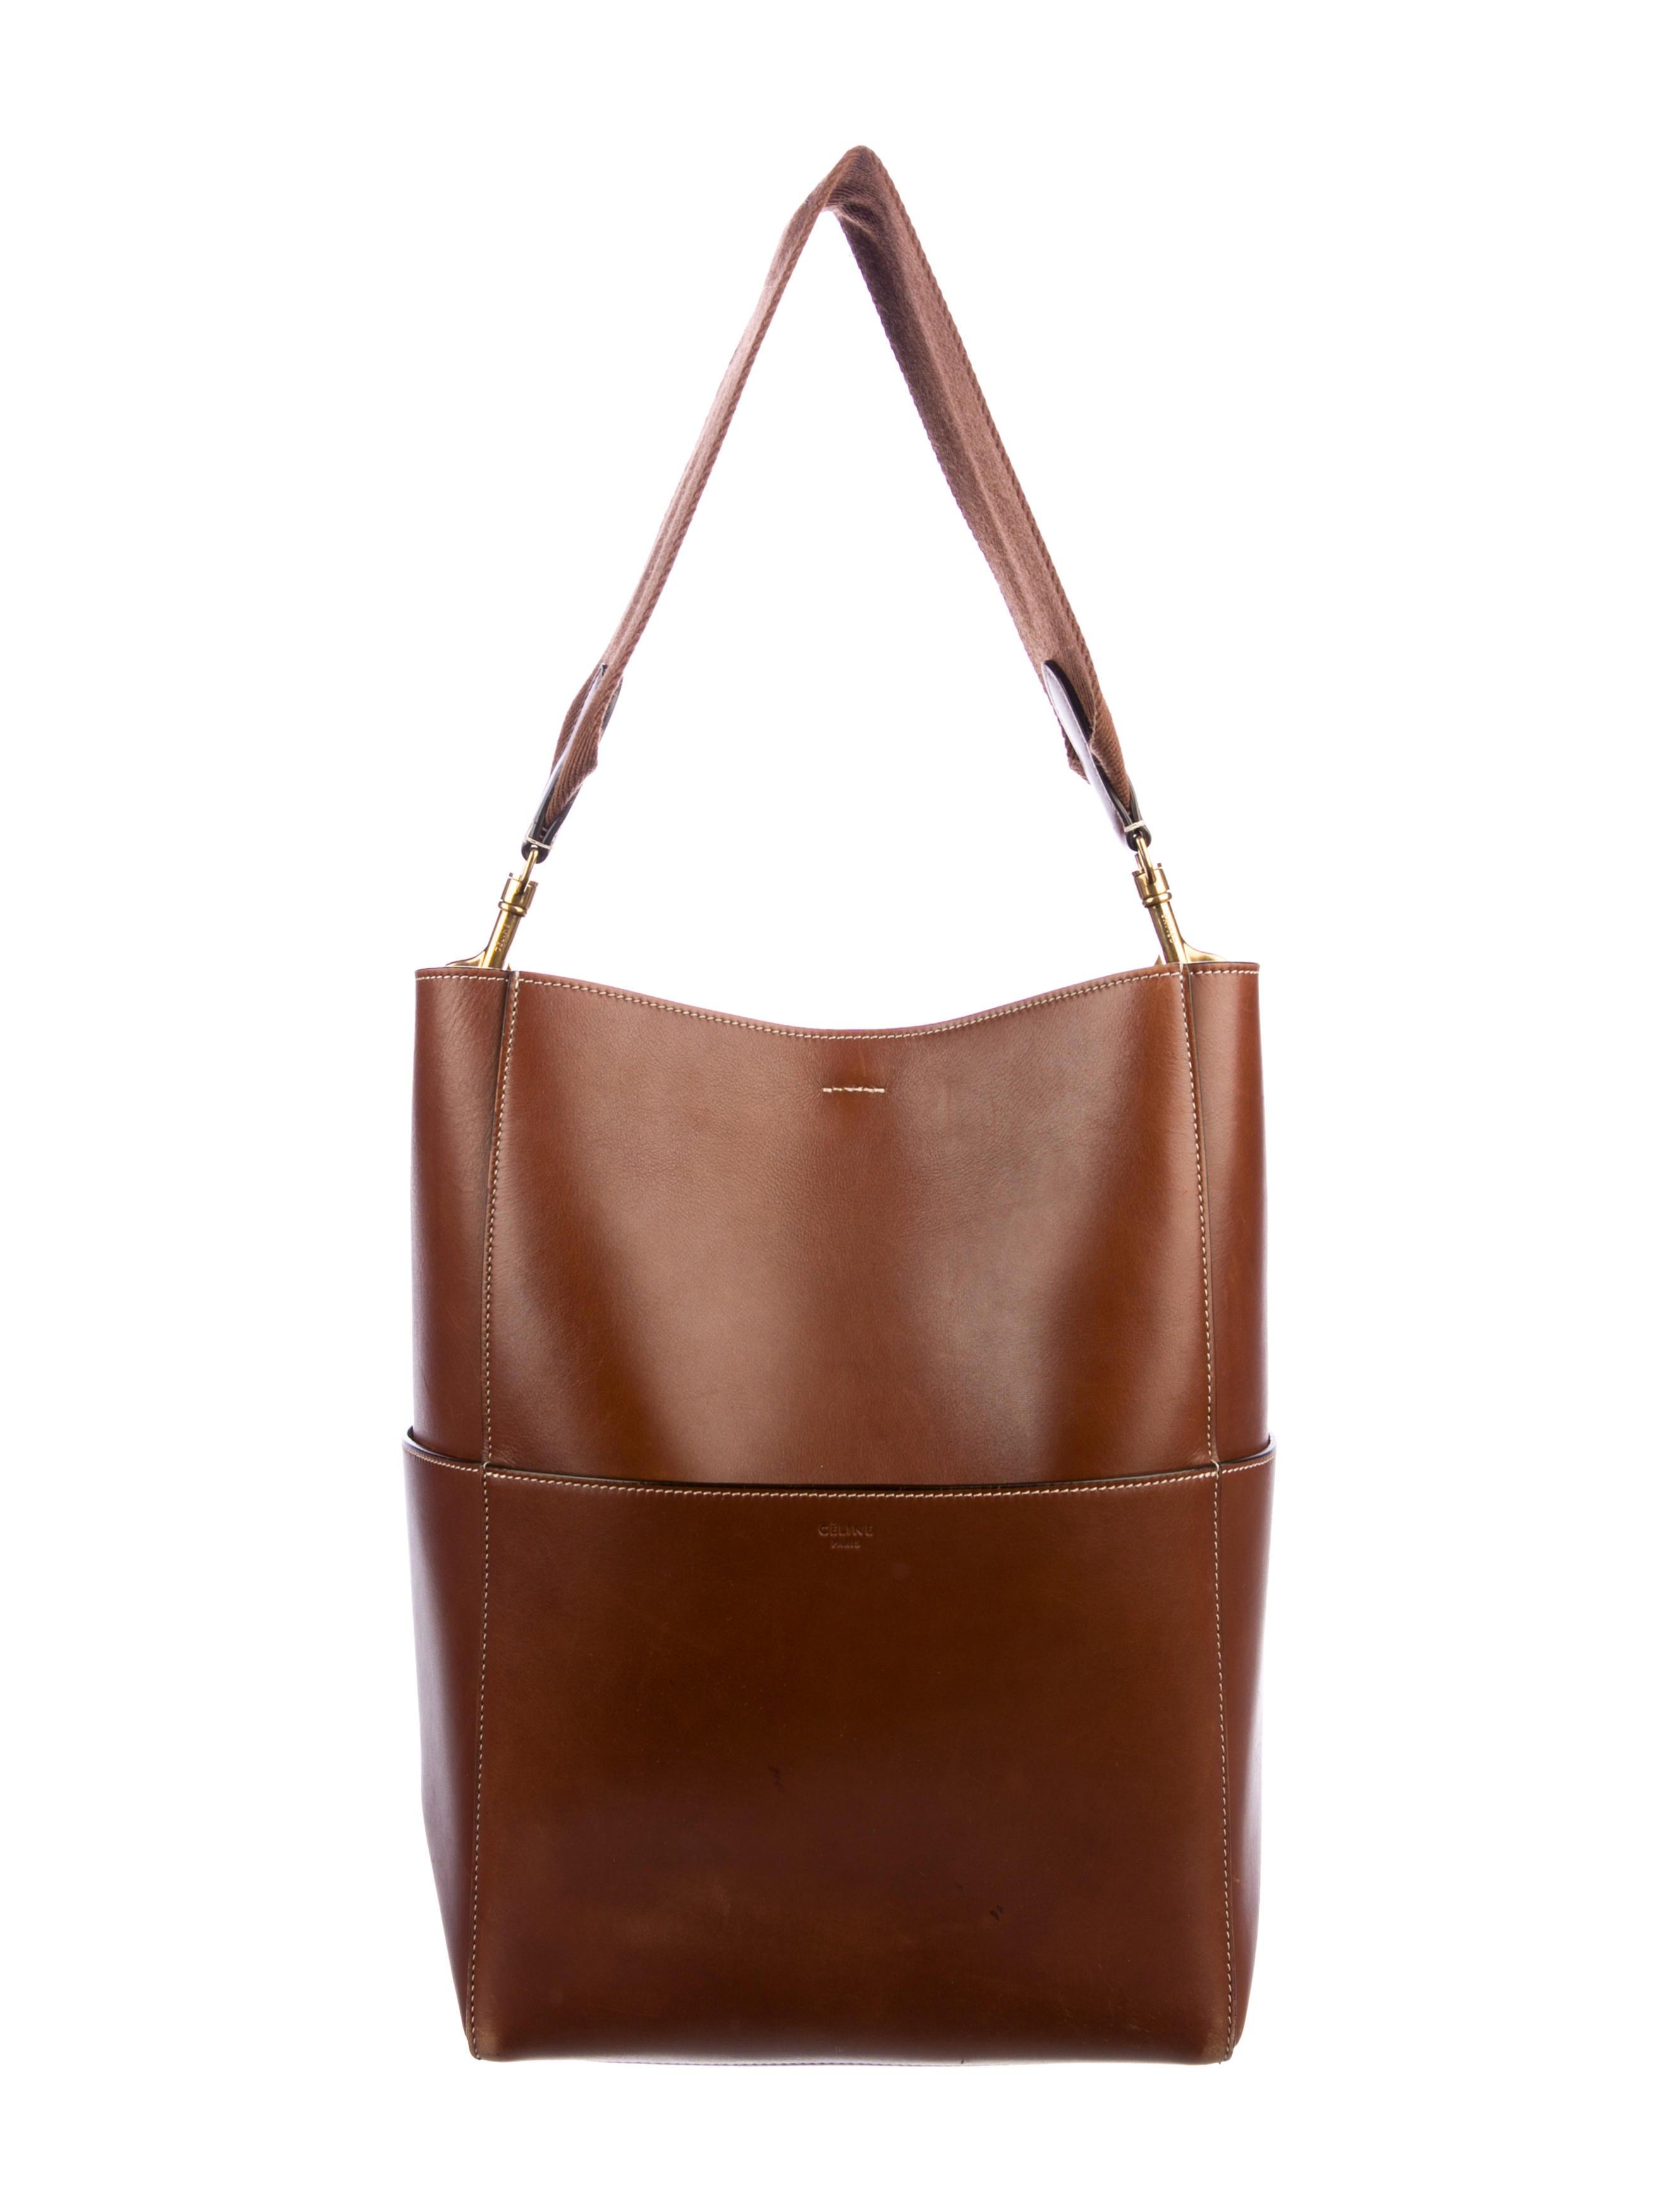 b17d78d85888 Celine 2017 Seau Sangle w  Additional Strap - Handbags - CEL83870 ...